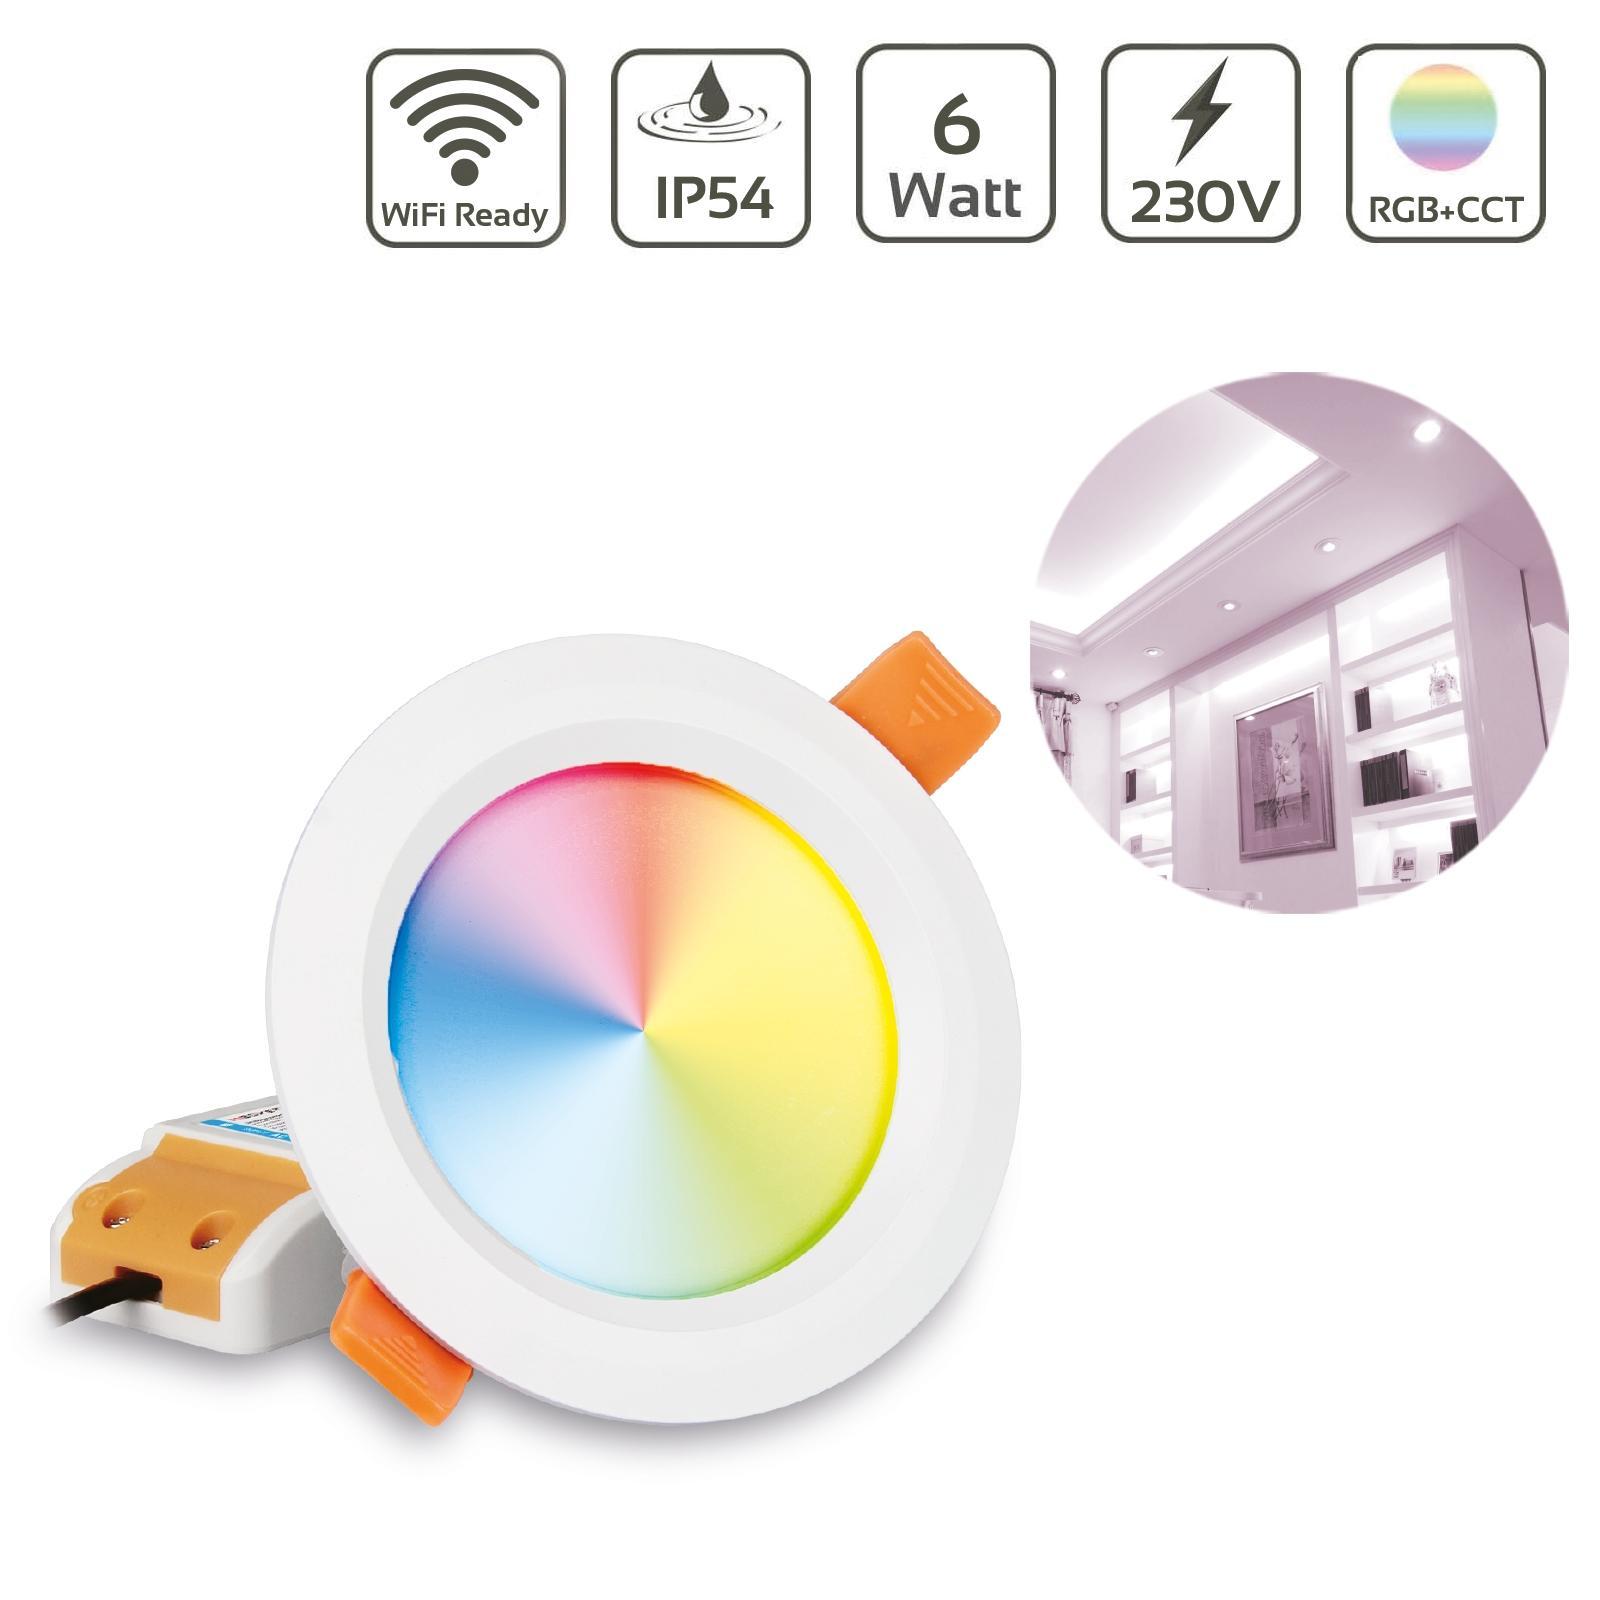 MiBoxer LED Einbaustrahler RGB+CCT 6W IP54 Ø111mm 2,4GHz WiFiready FUT063